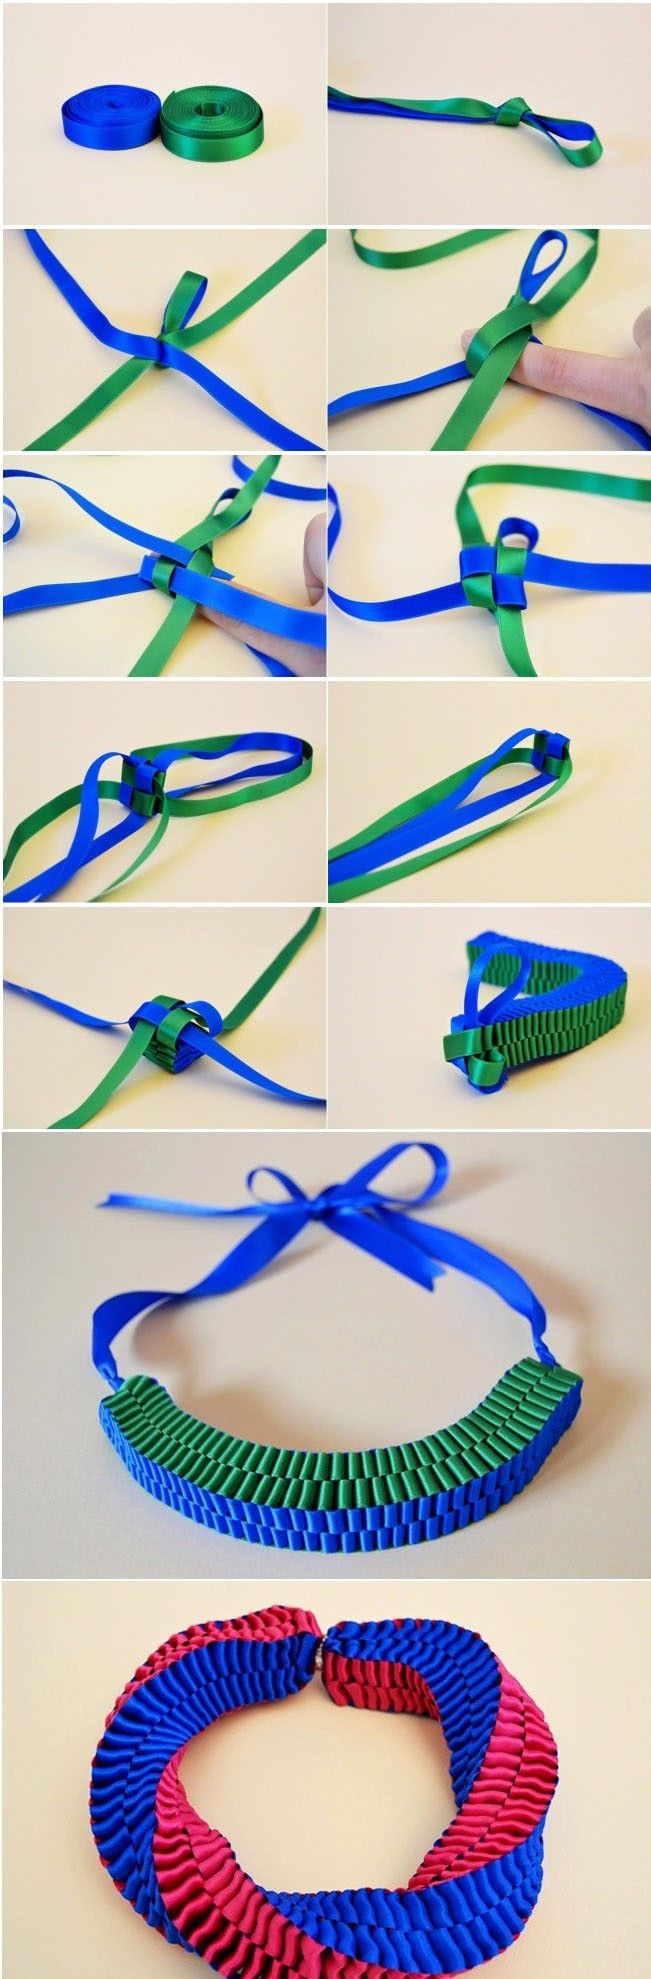 DIY Fashion Necklace